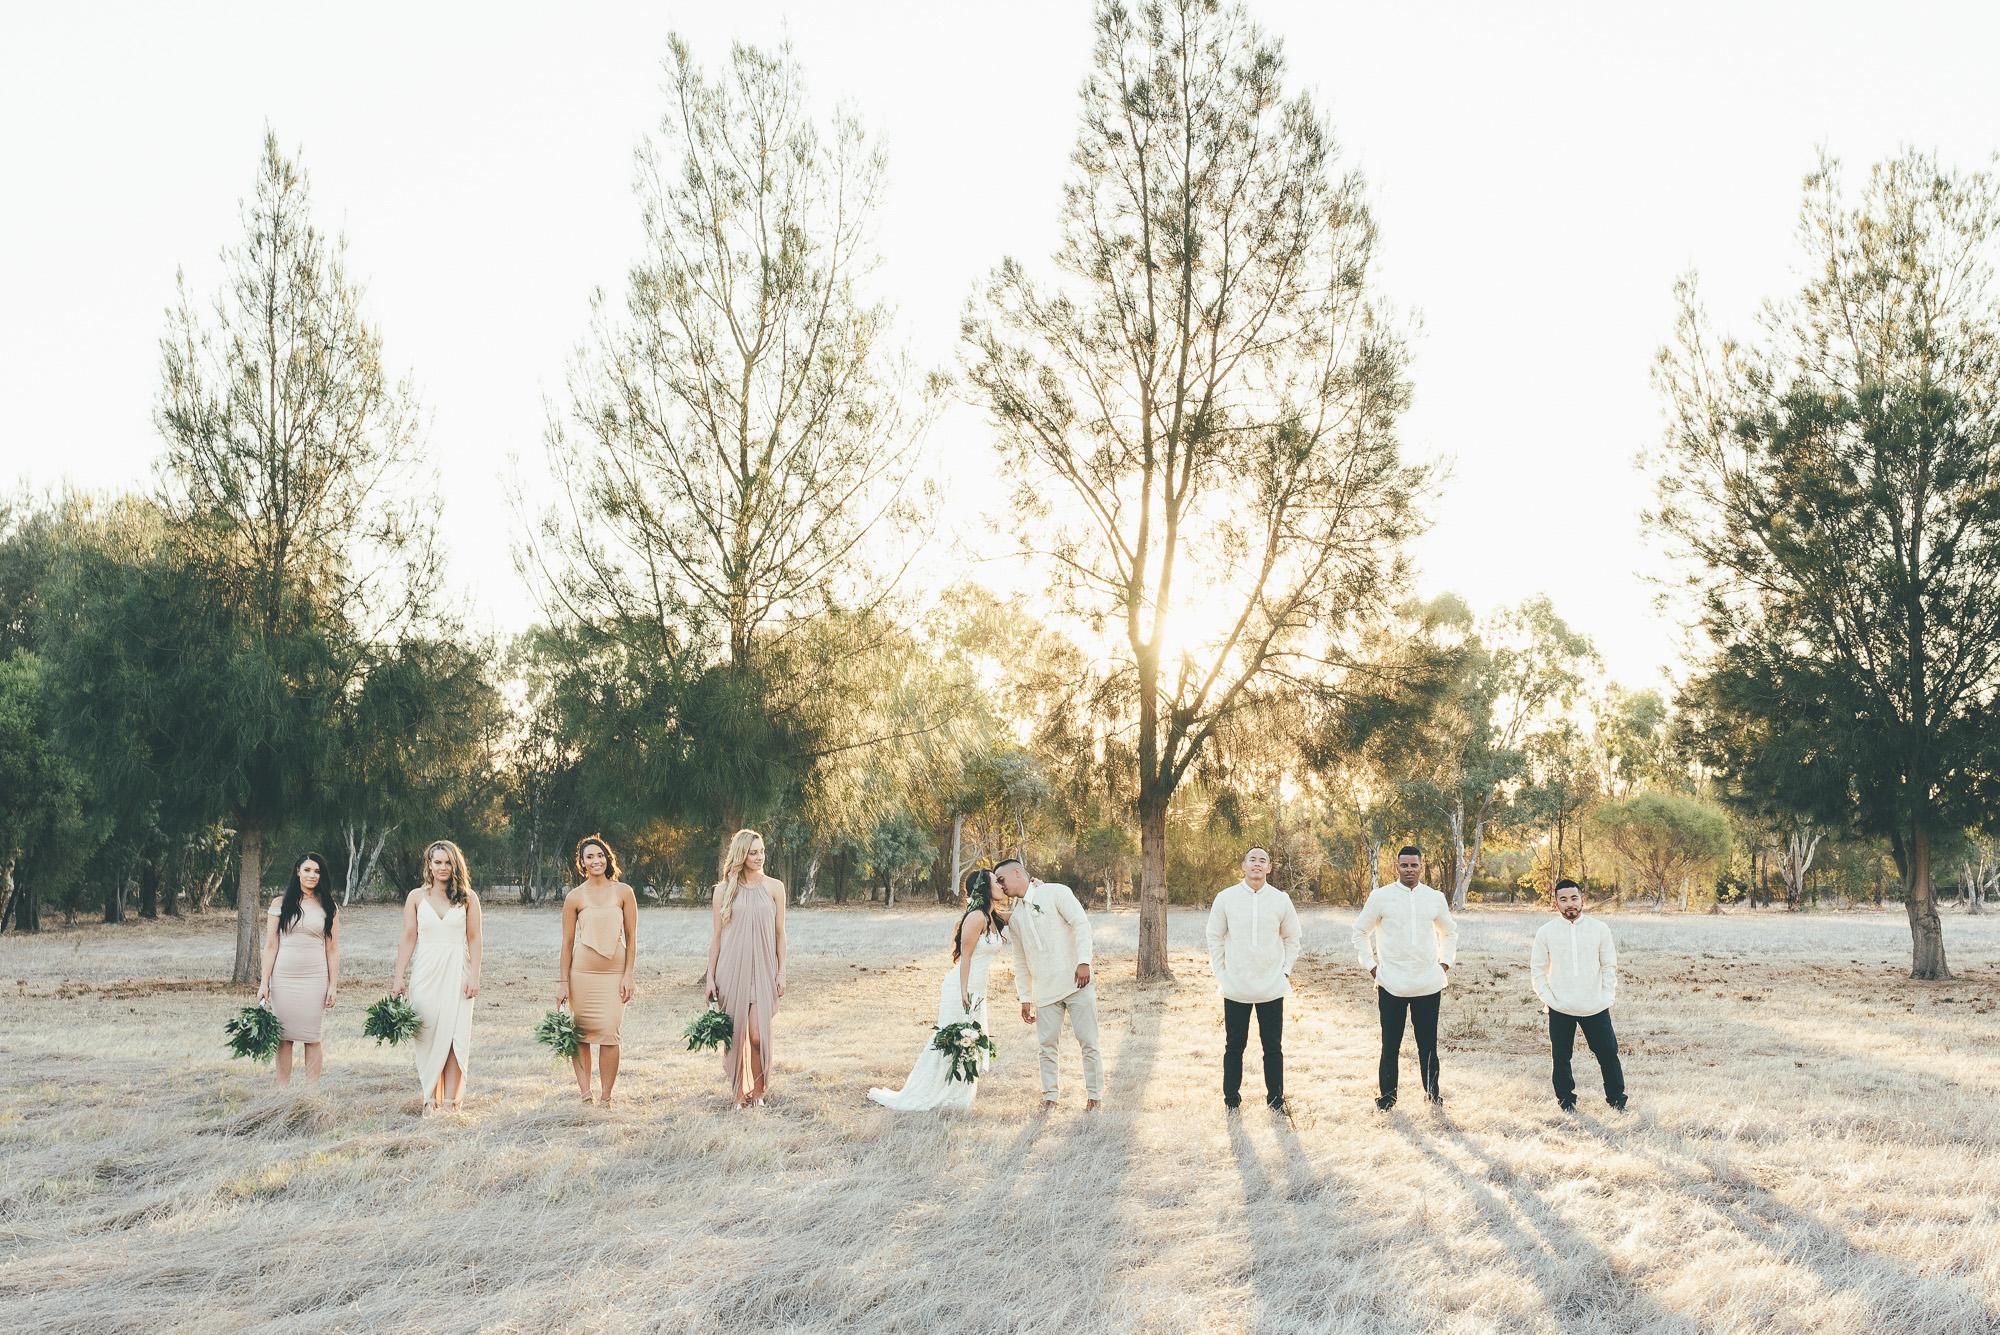 wedding-photographer-outdoor-casual-styled-los-angeles-australia-california-international-earthbound -67.jpg